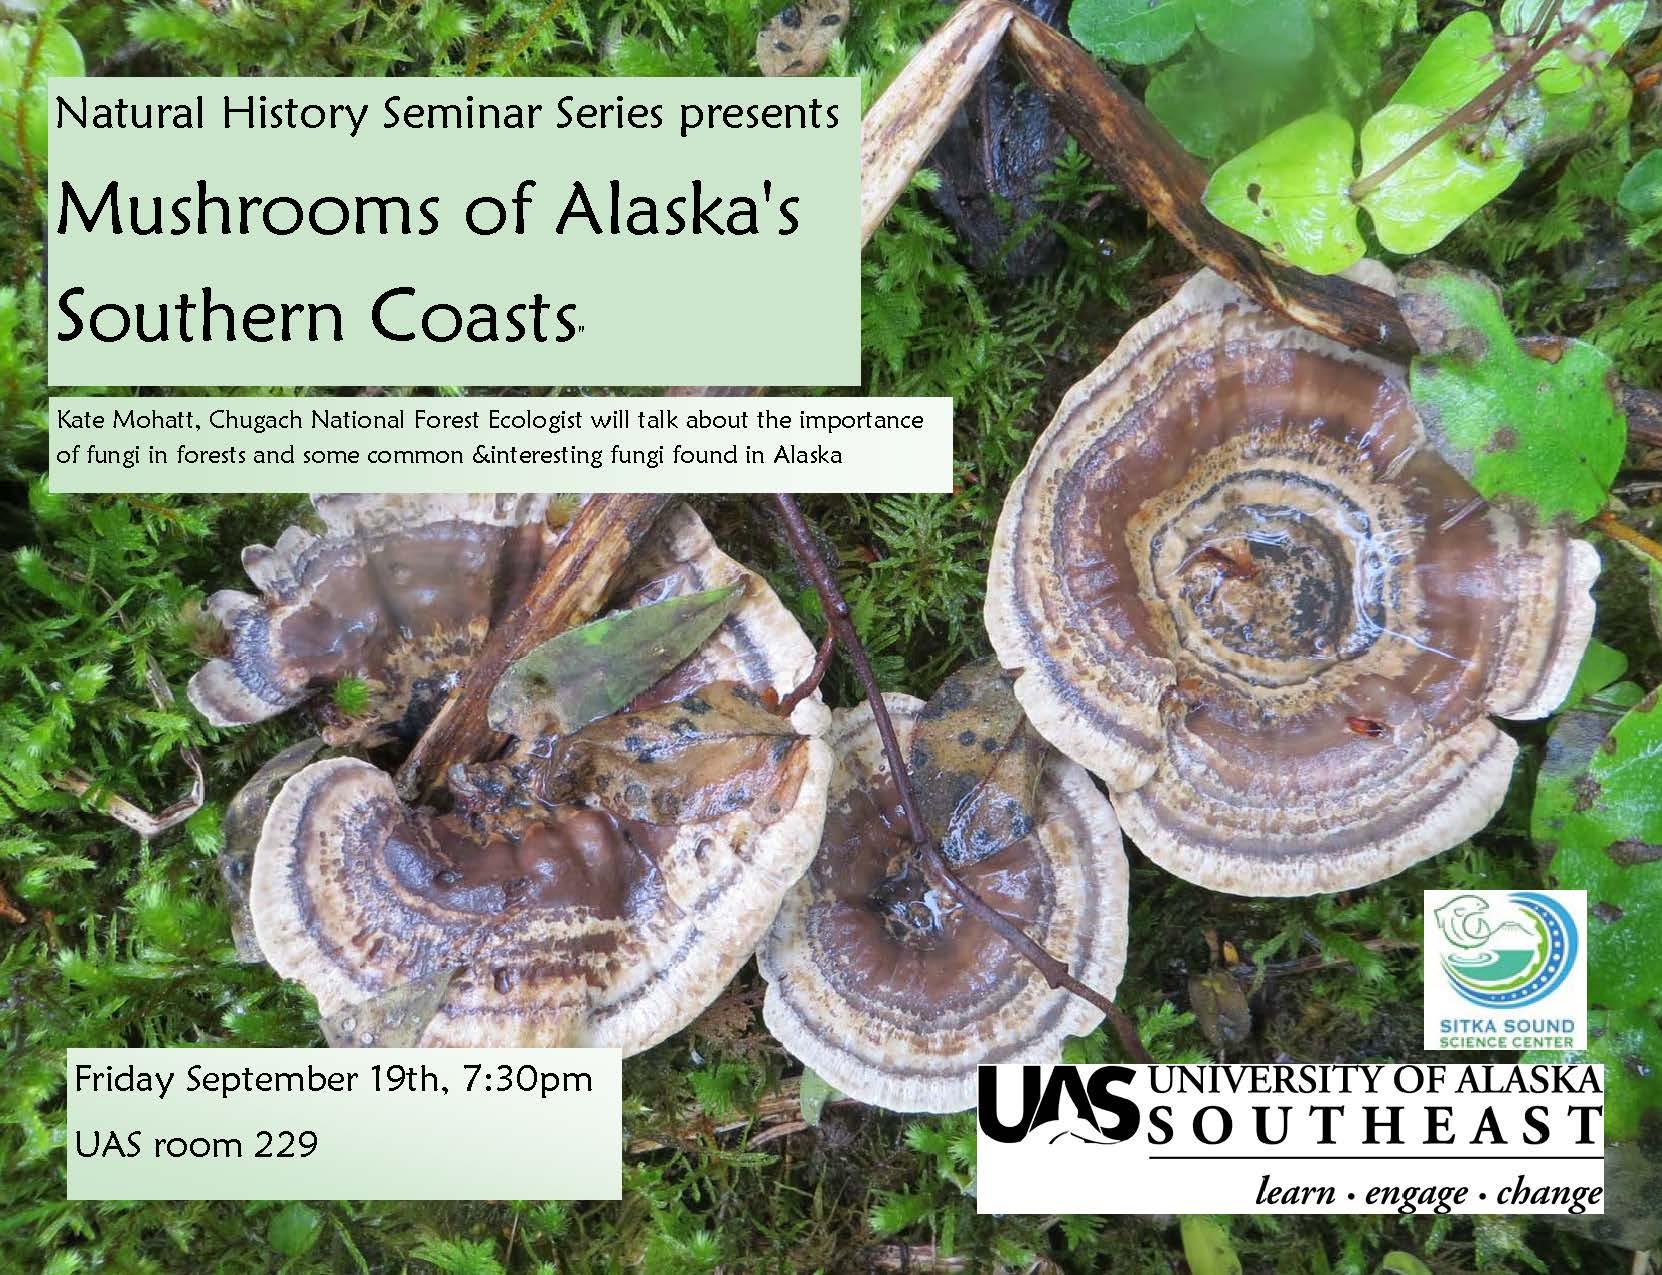 Mushrooms sitka local foods network for Alaskan cuisine history